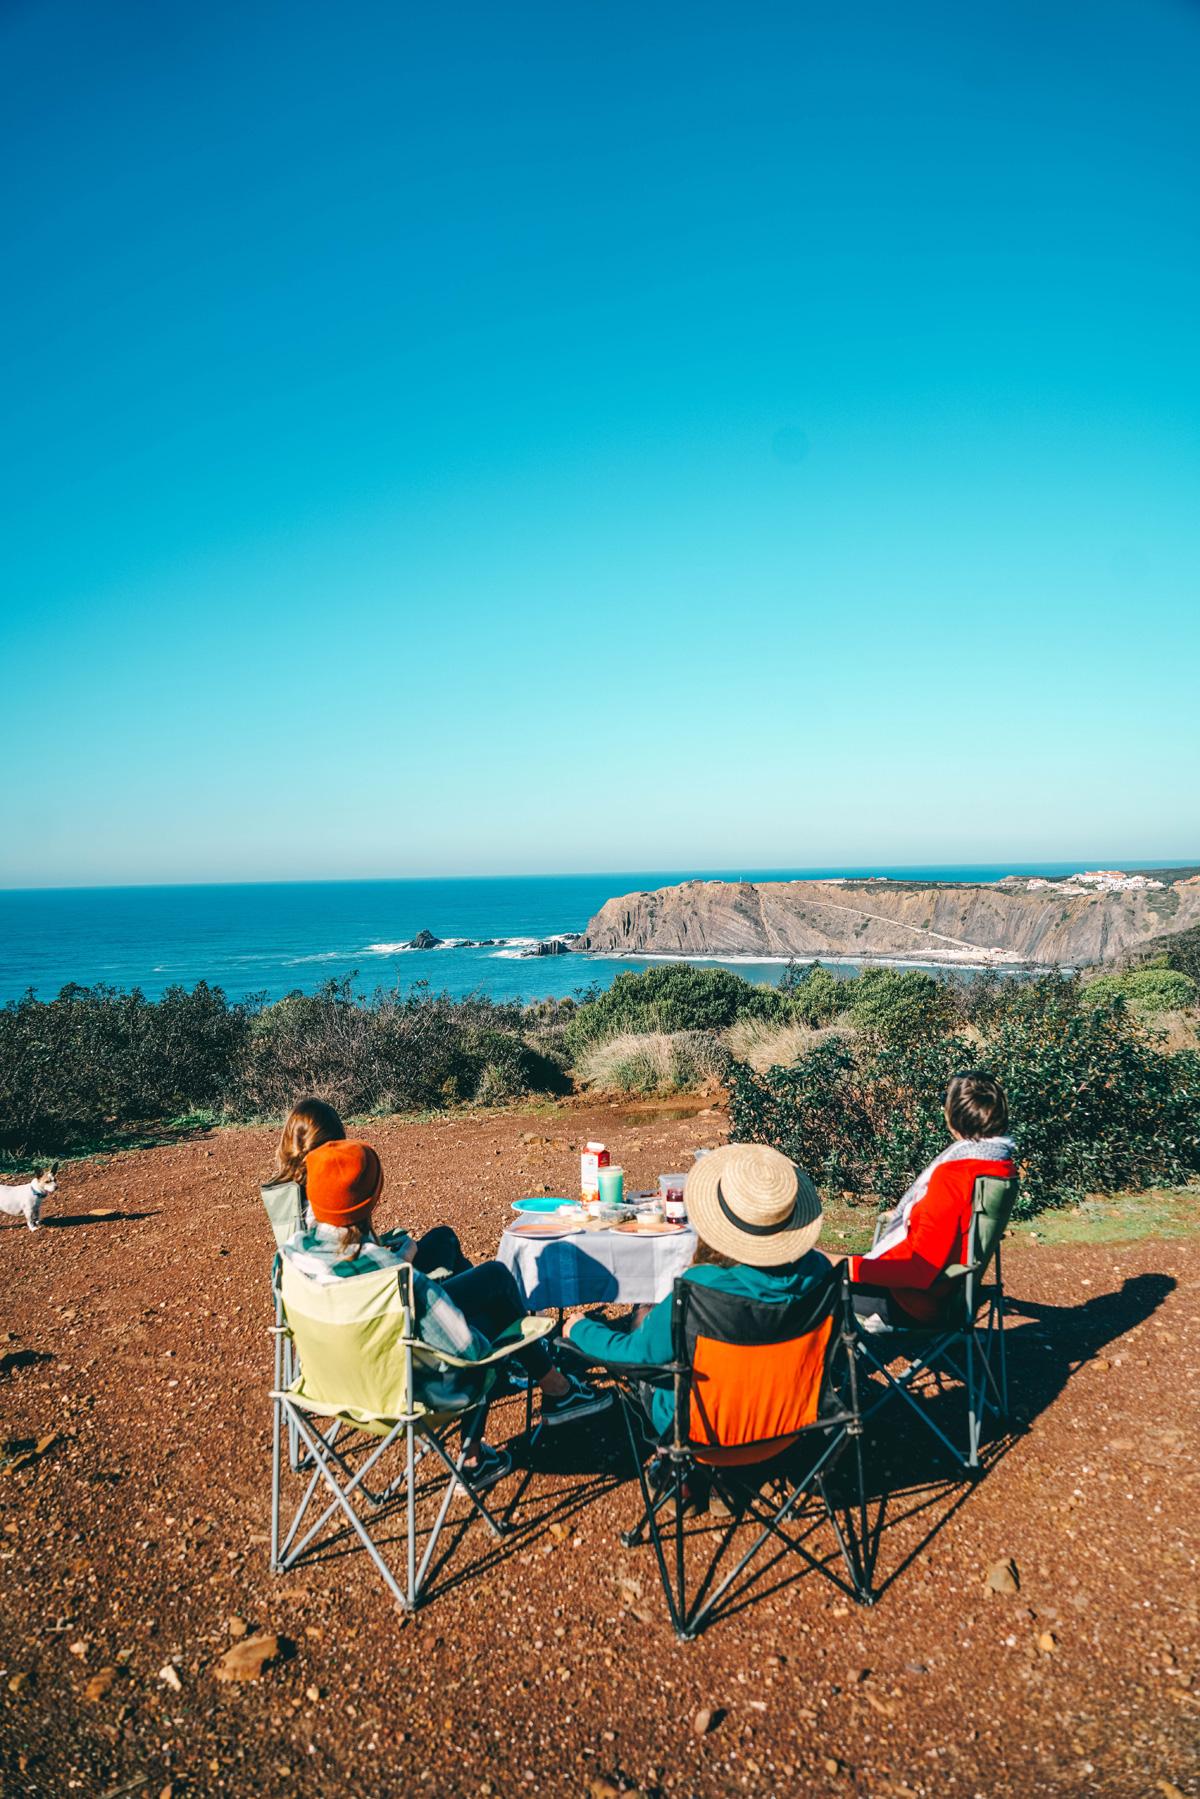 Sandy Toes Algarve Picknick